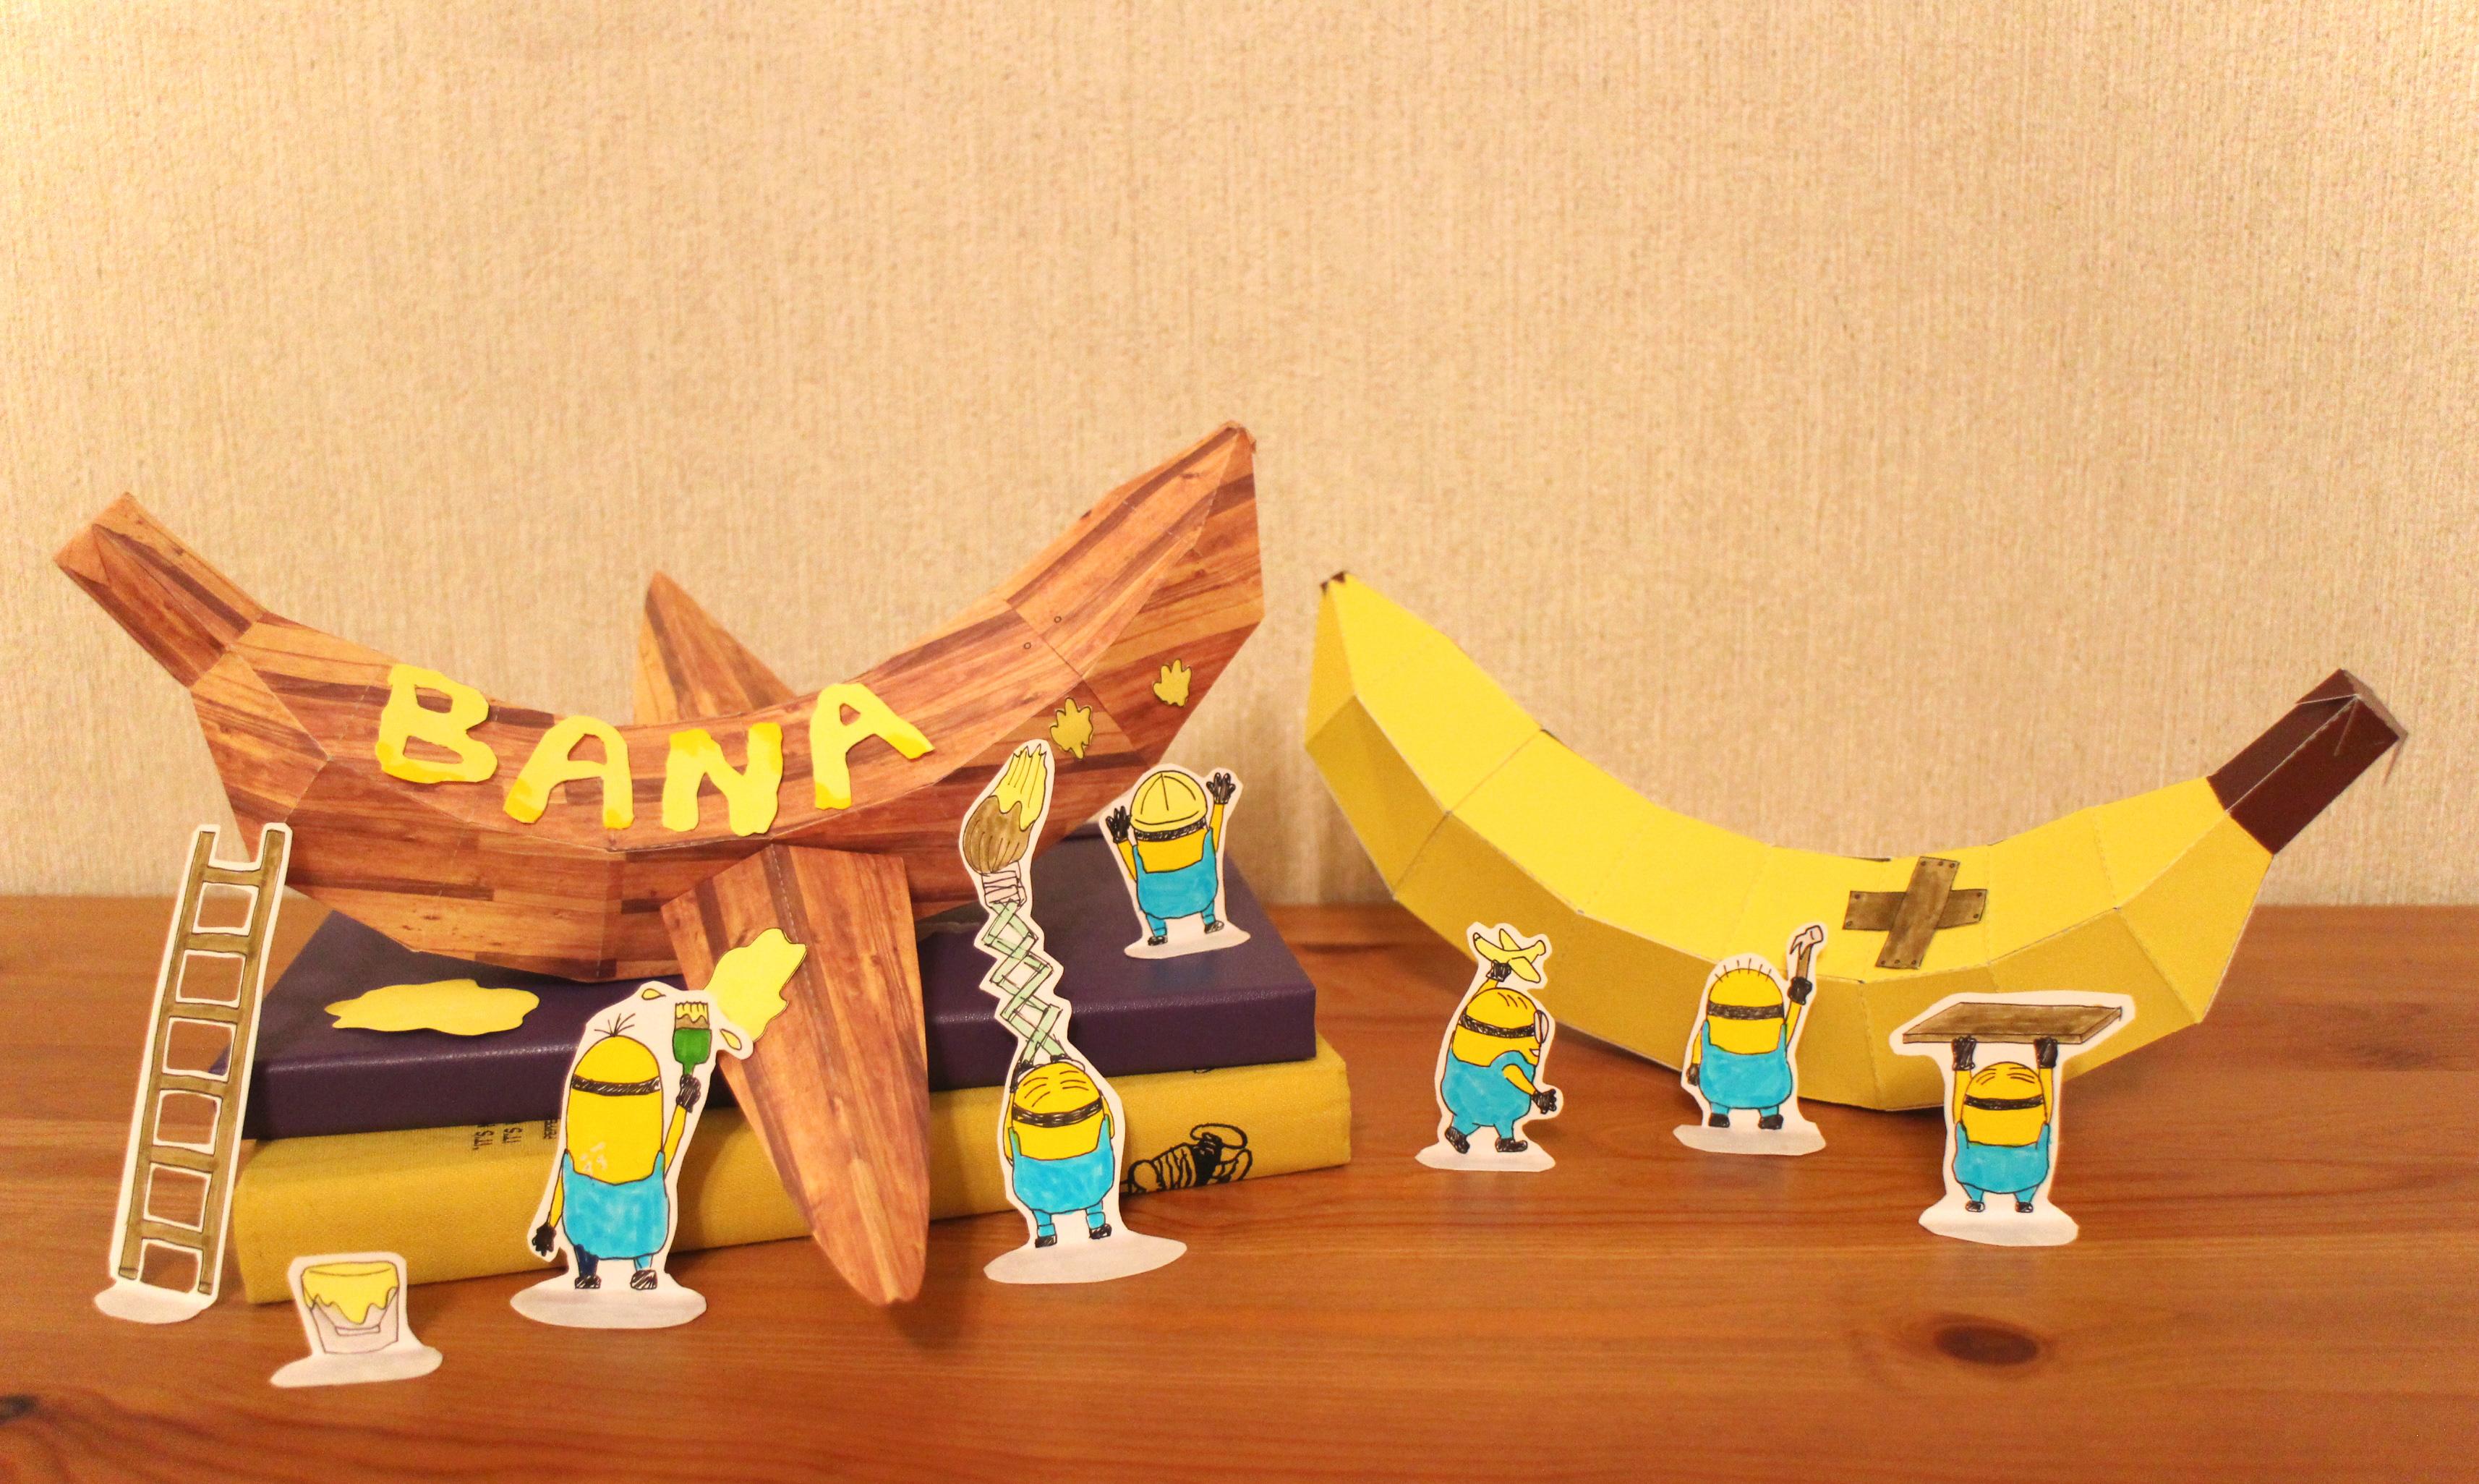 Banana plane.